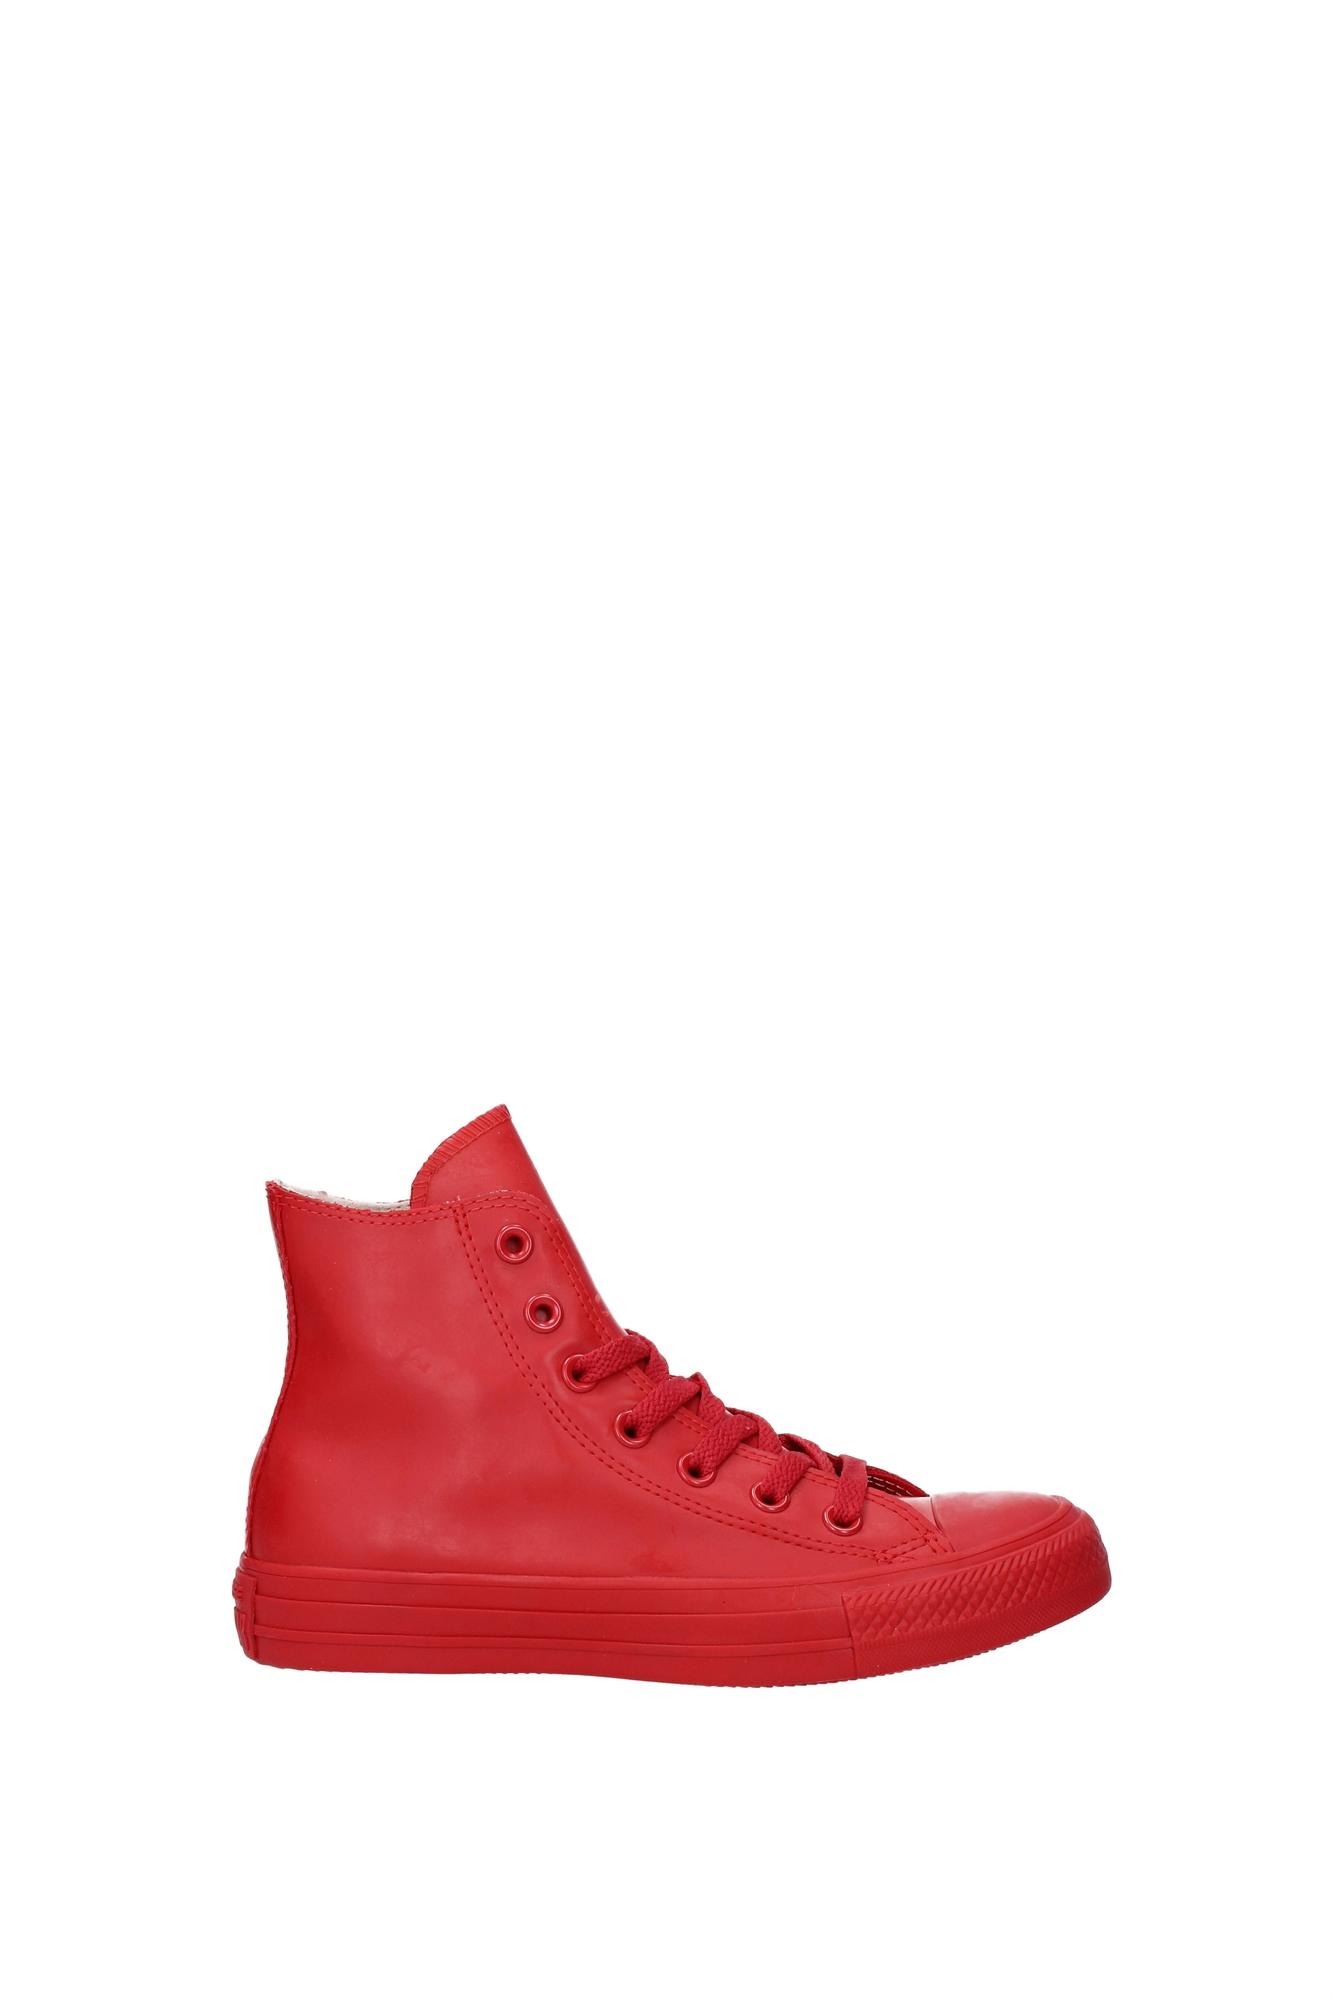 Sneakers Converse Damens -  (144744C)